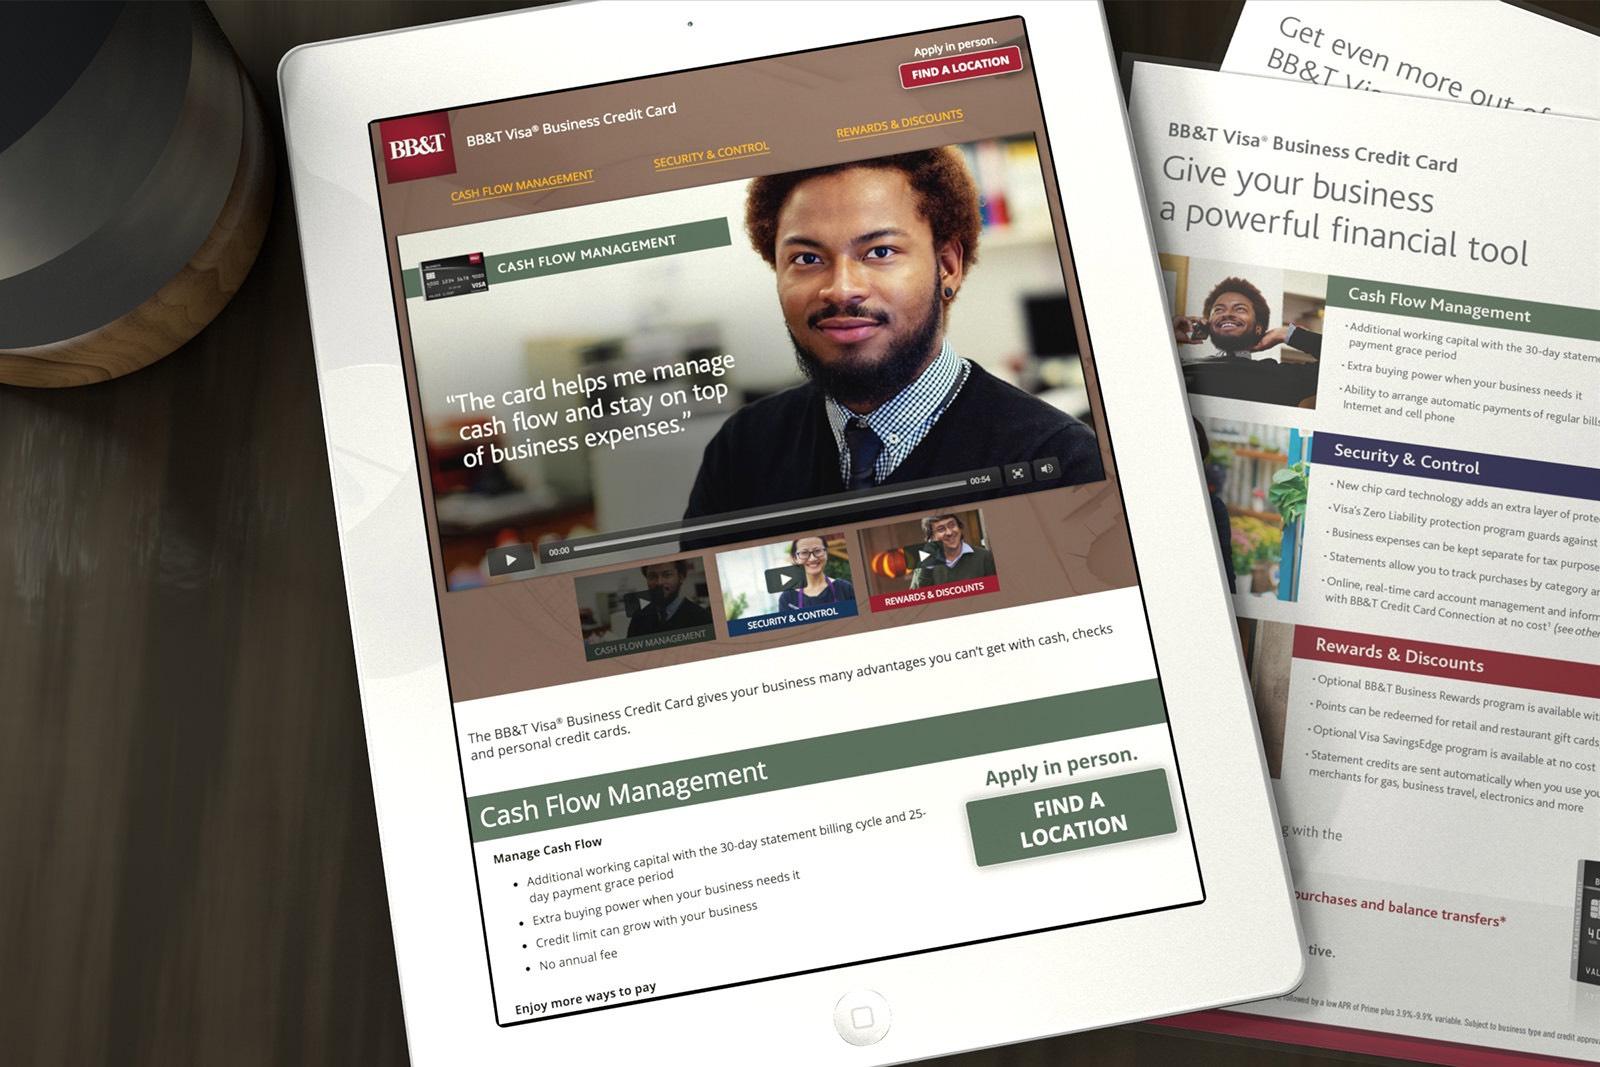 Media Logic Develops BB&T Microsite To Market Business ...